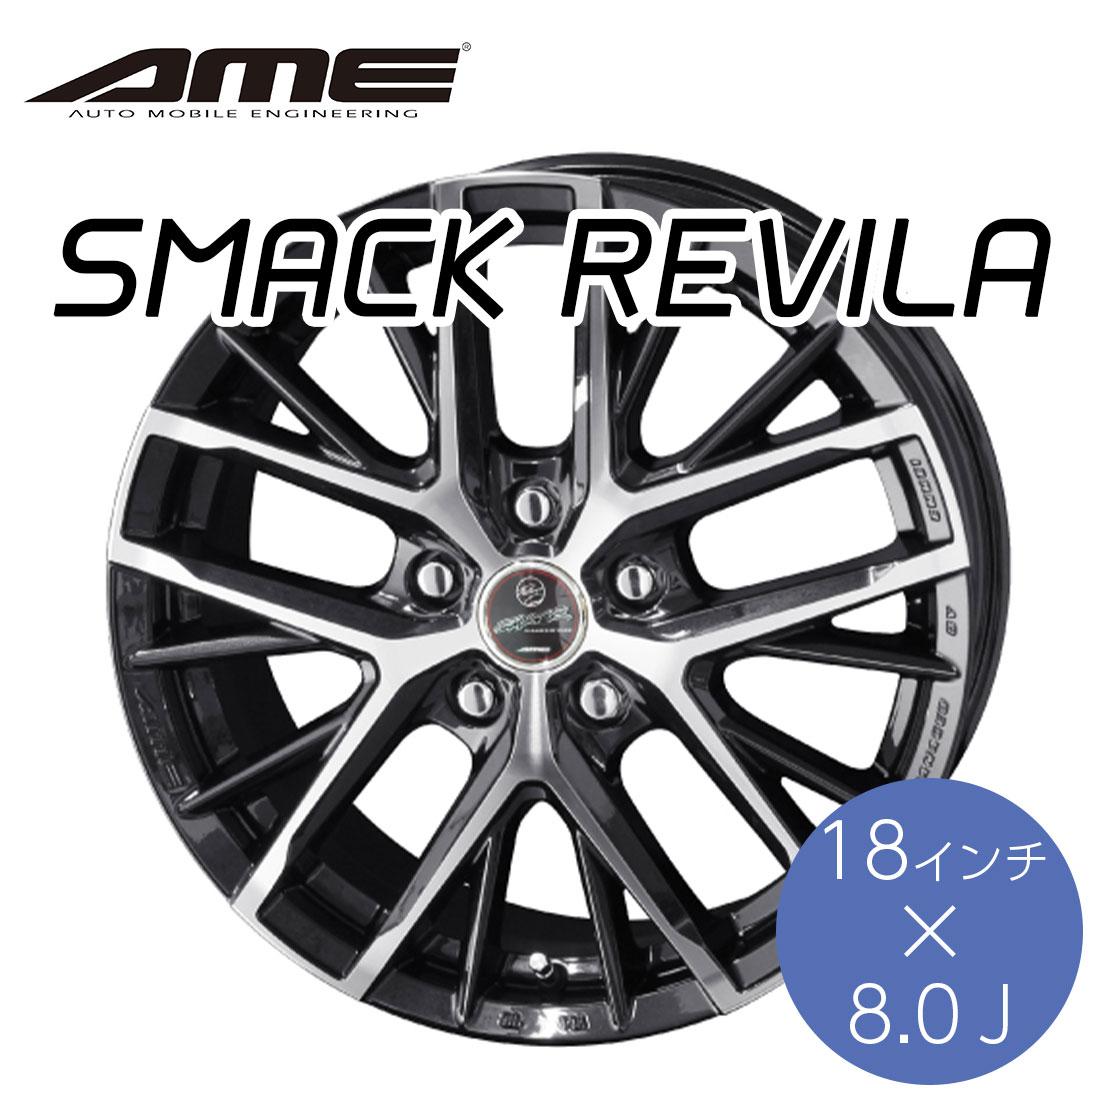 KYOHO ホイール スマック レヴィラ 18×8.0J インチ 5H PCD 114.3 SMACK REVILA by AME 共豊 サファイアブラック×ポリッシュ かっこいい 車